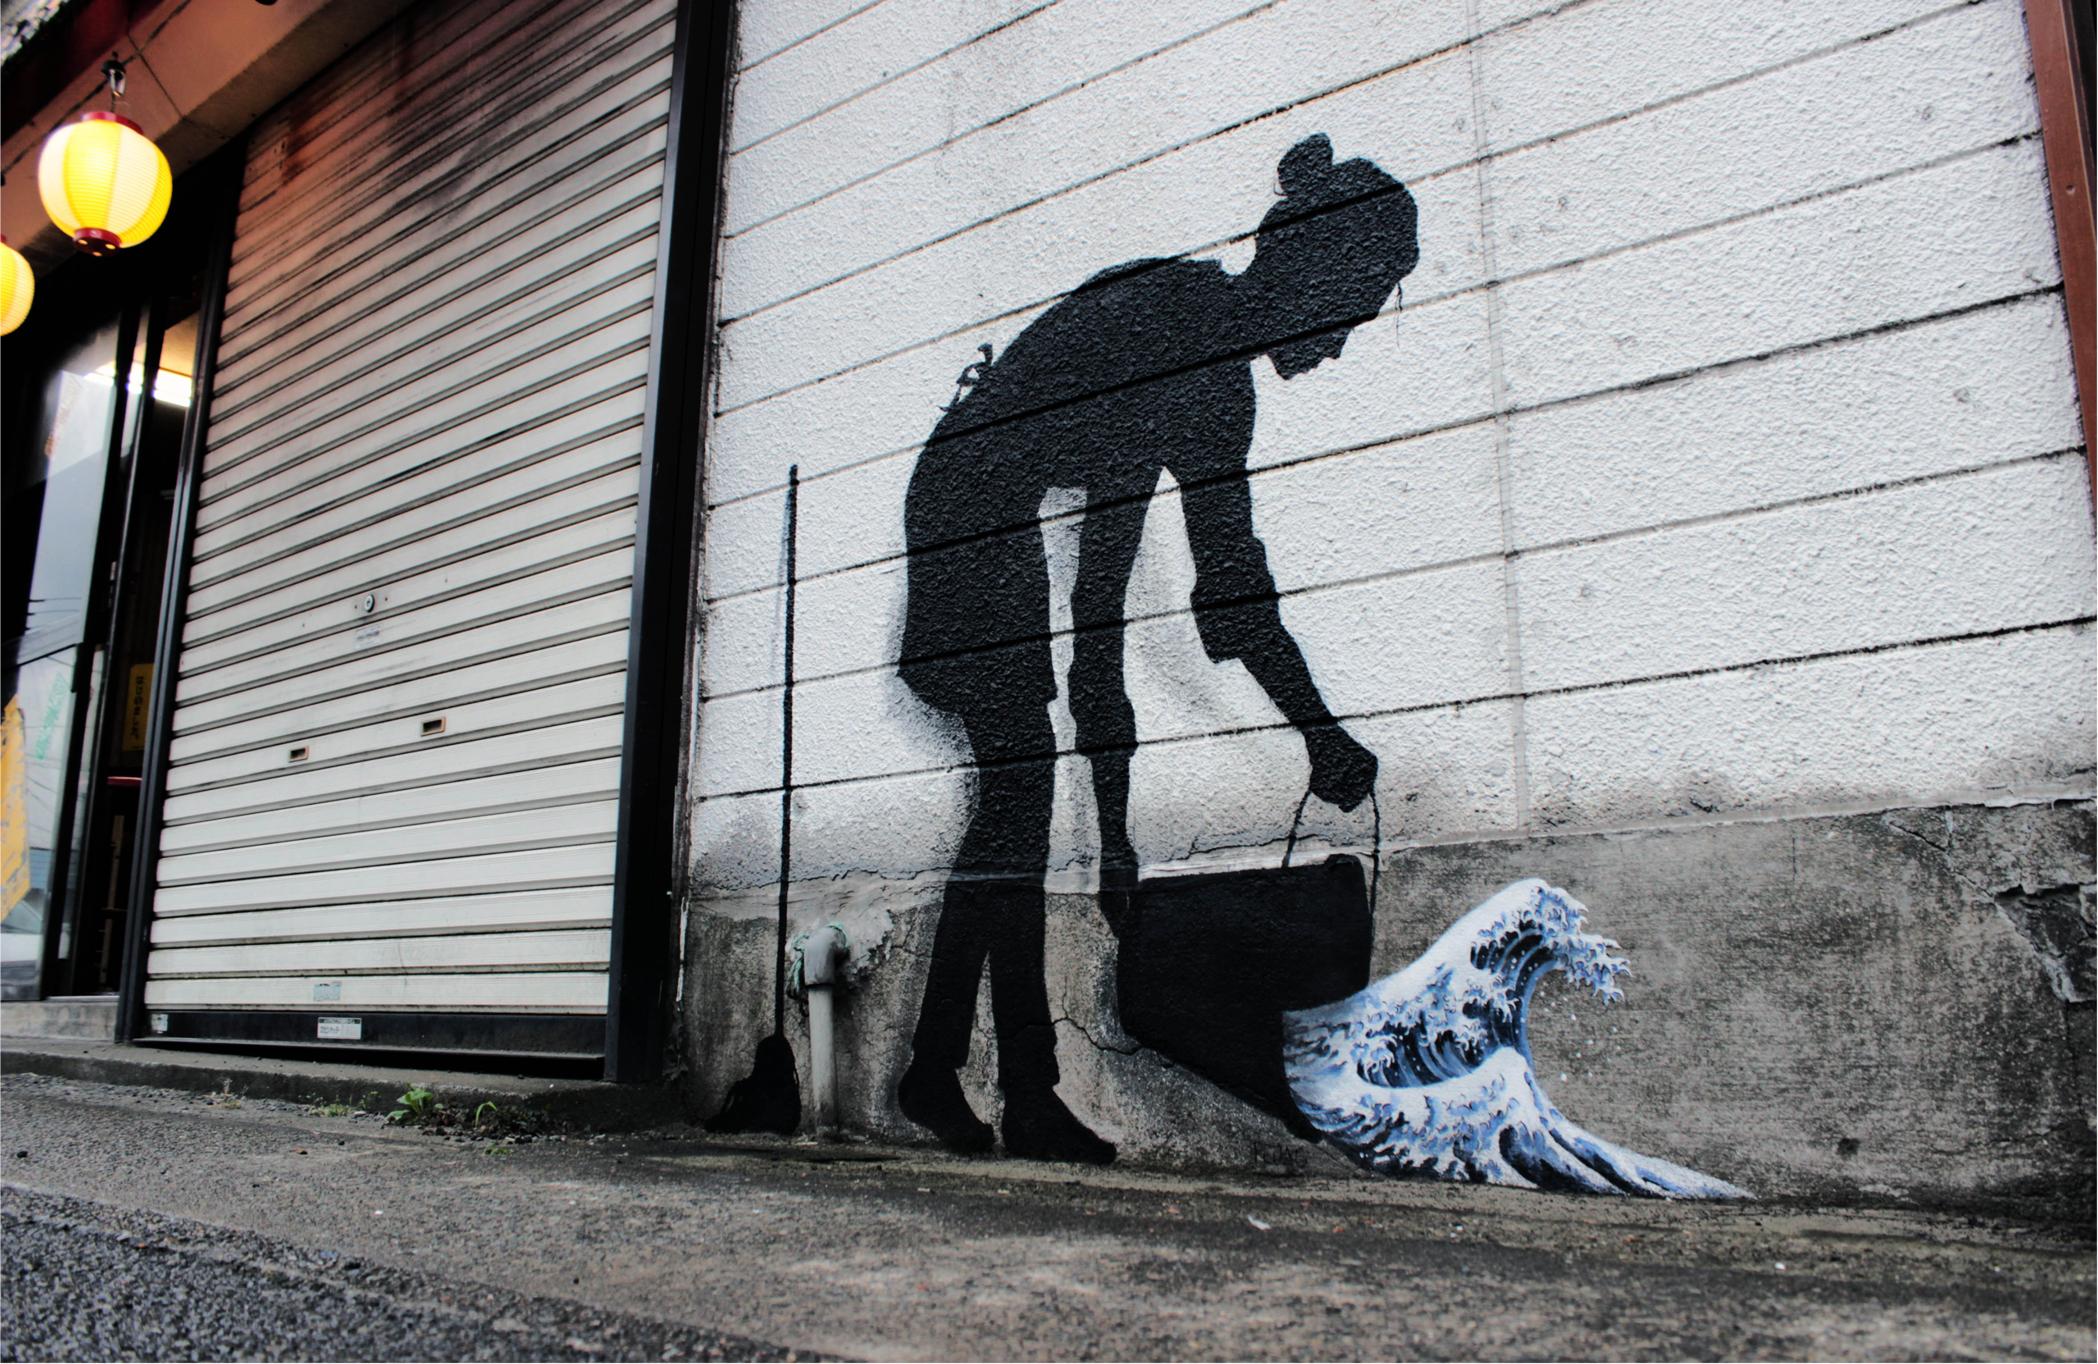 pejac-social-arte-graffiti-de-rua-10